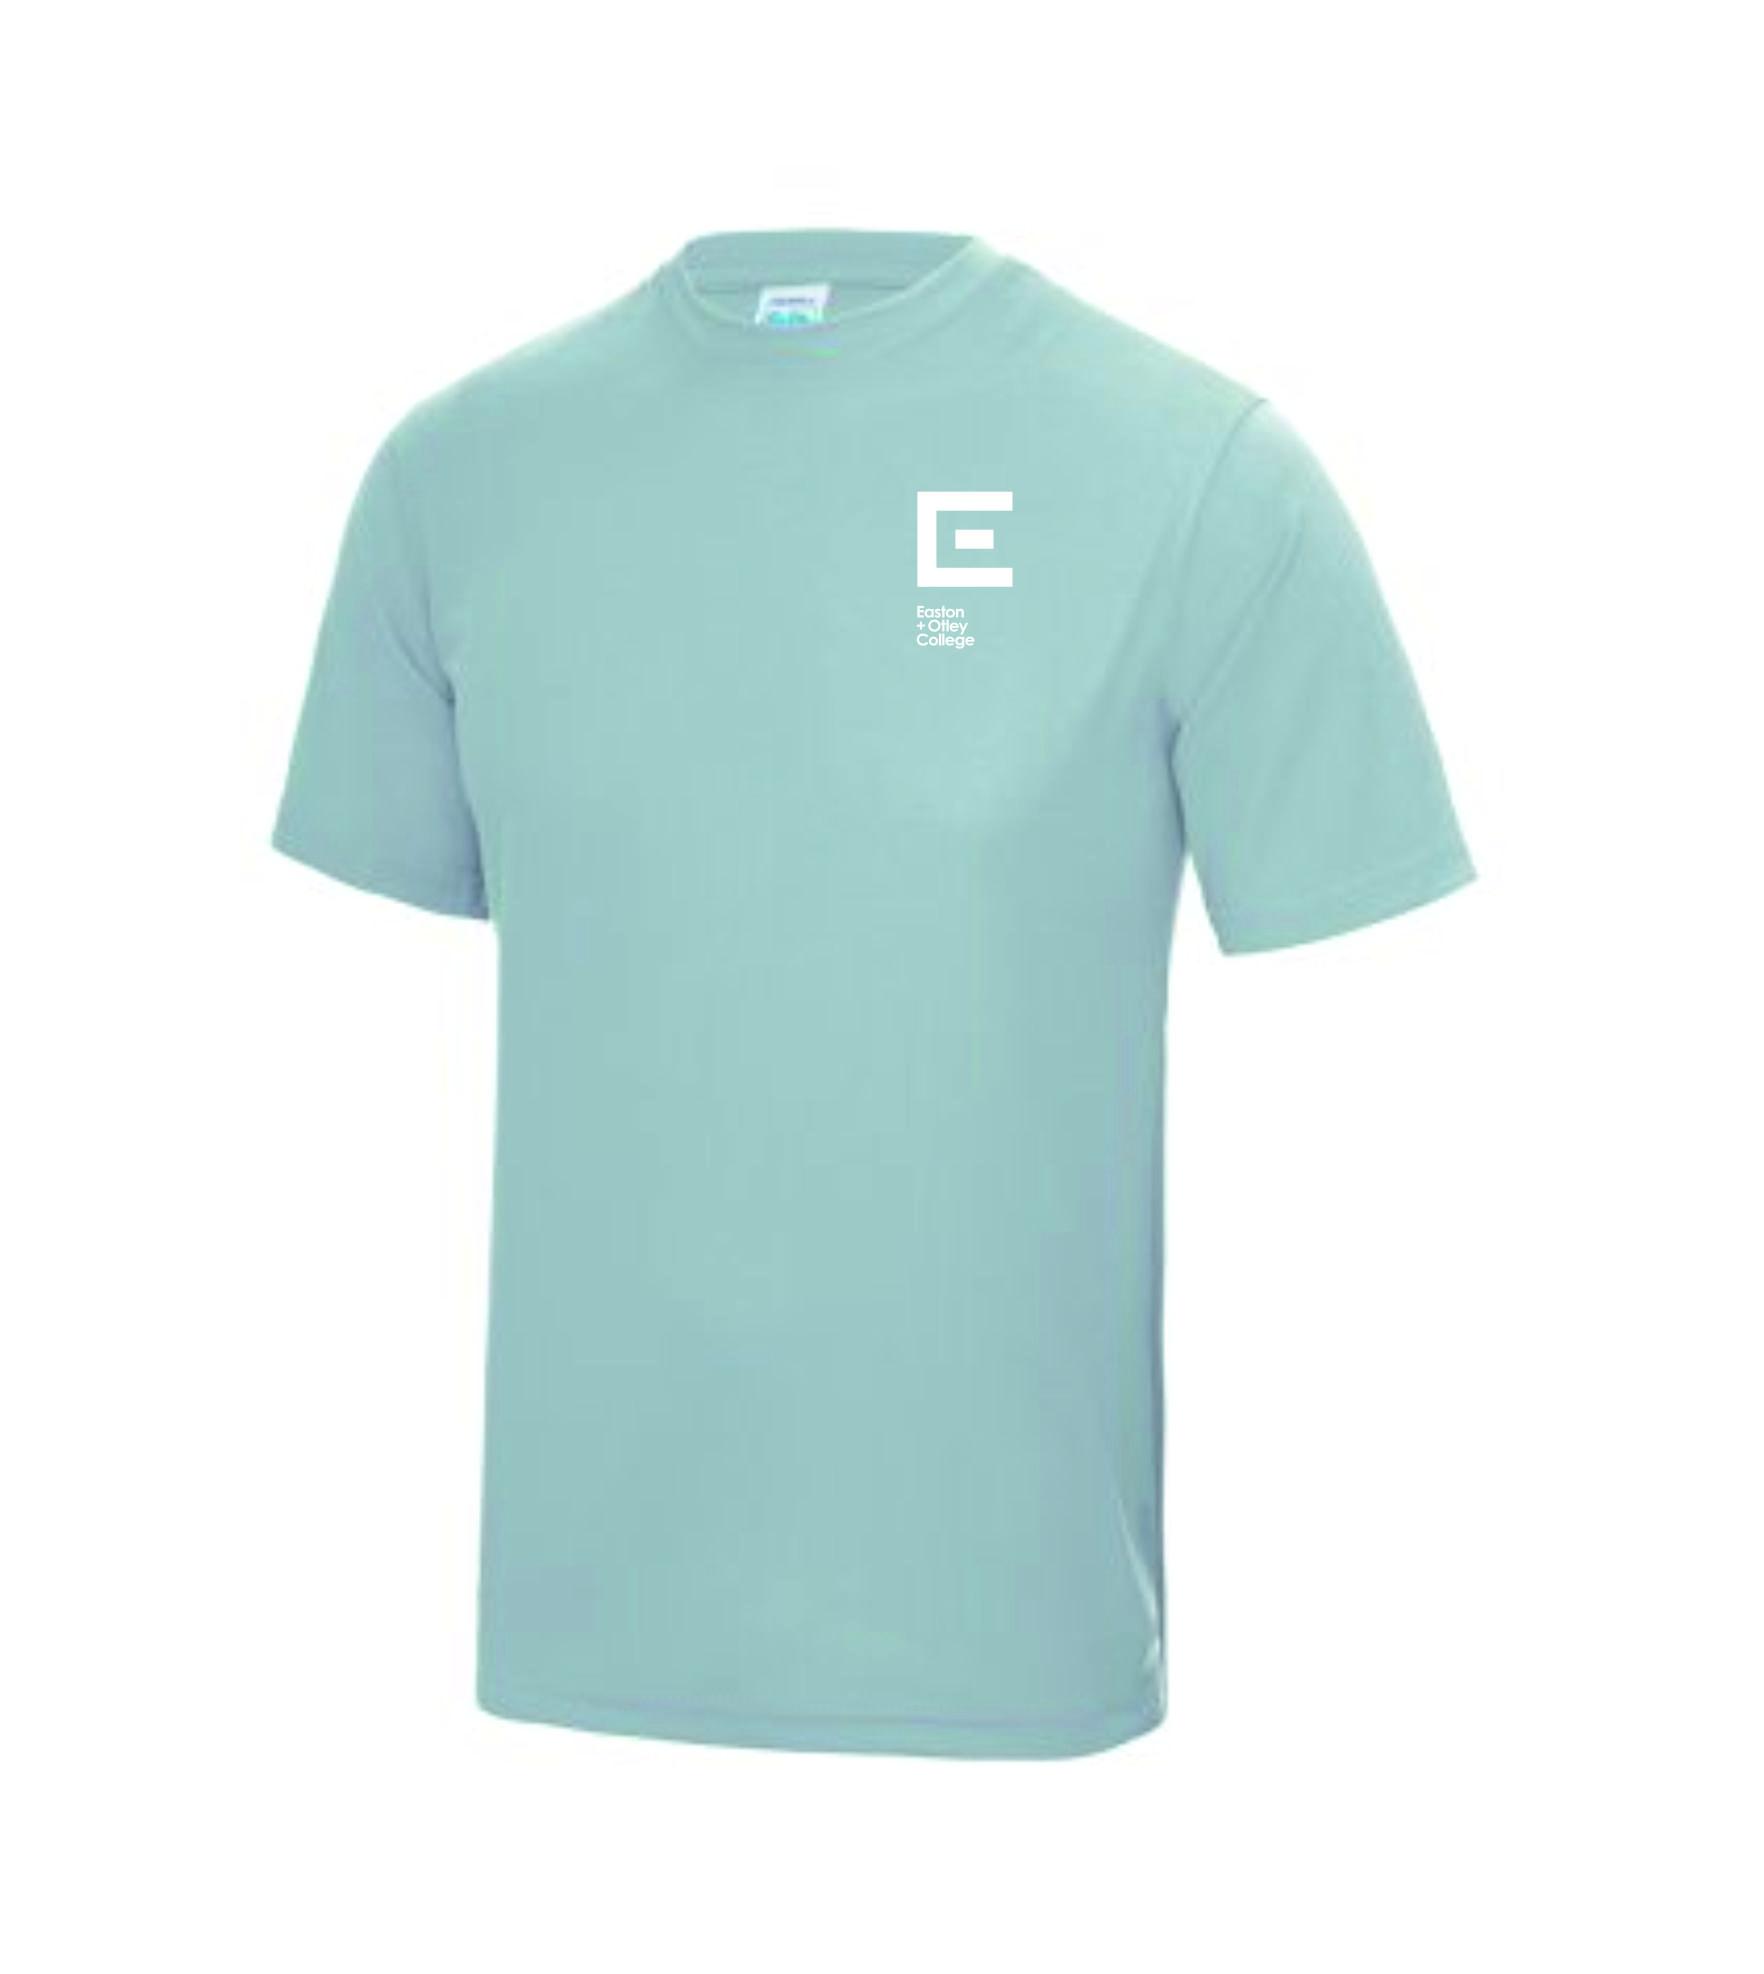 Easton PS T Shirt LB